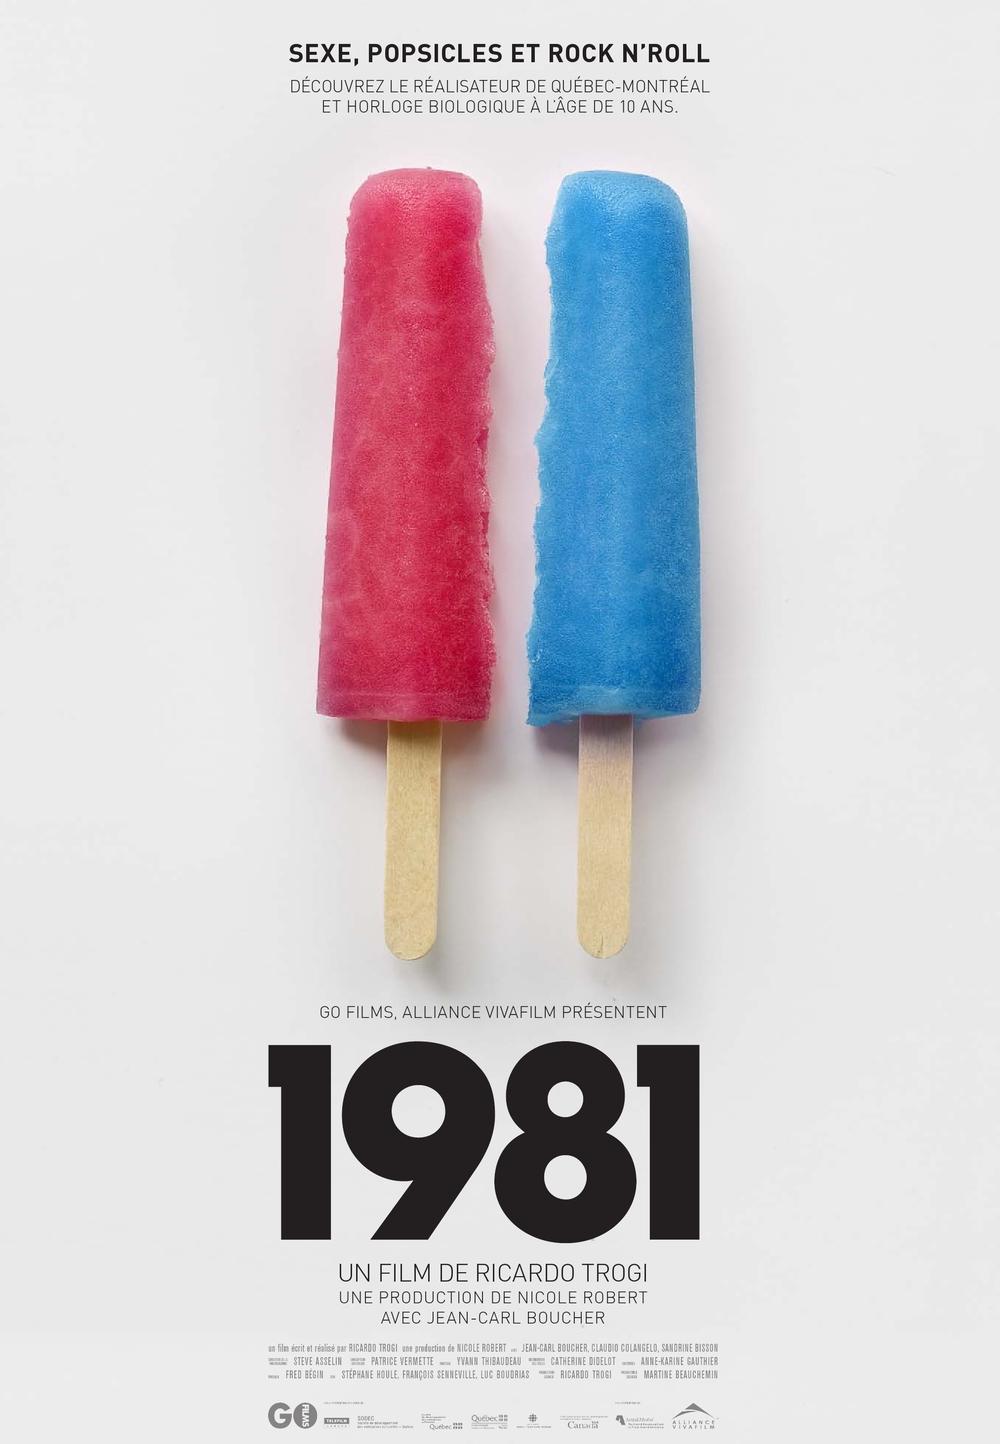 RENZO-1987-poster-concepts-31mars_00003.jpg